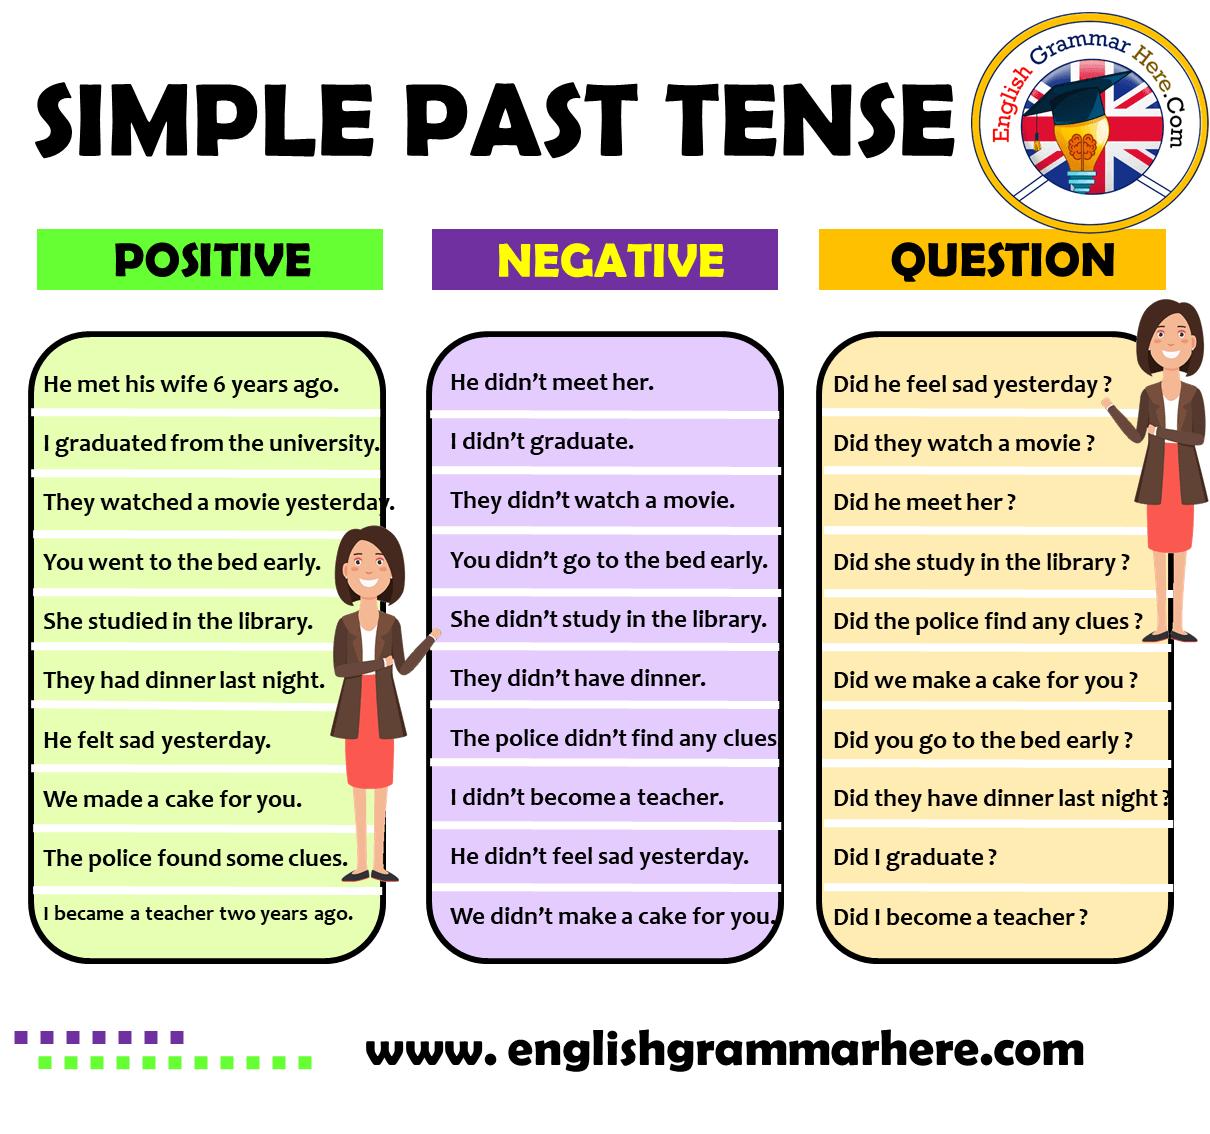 Simple Past Tense Positive Negative Question Examples